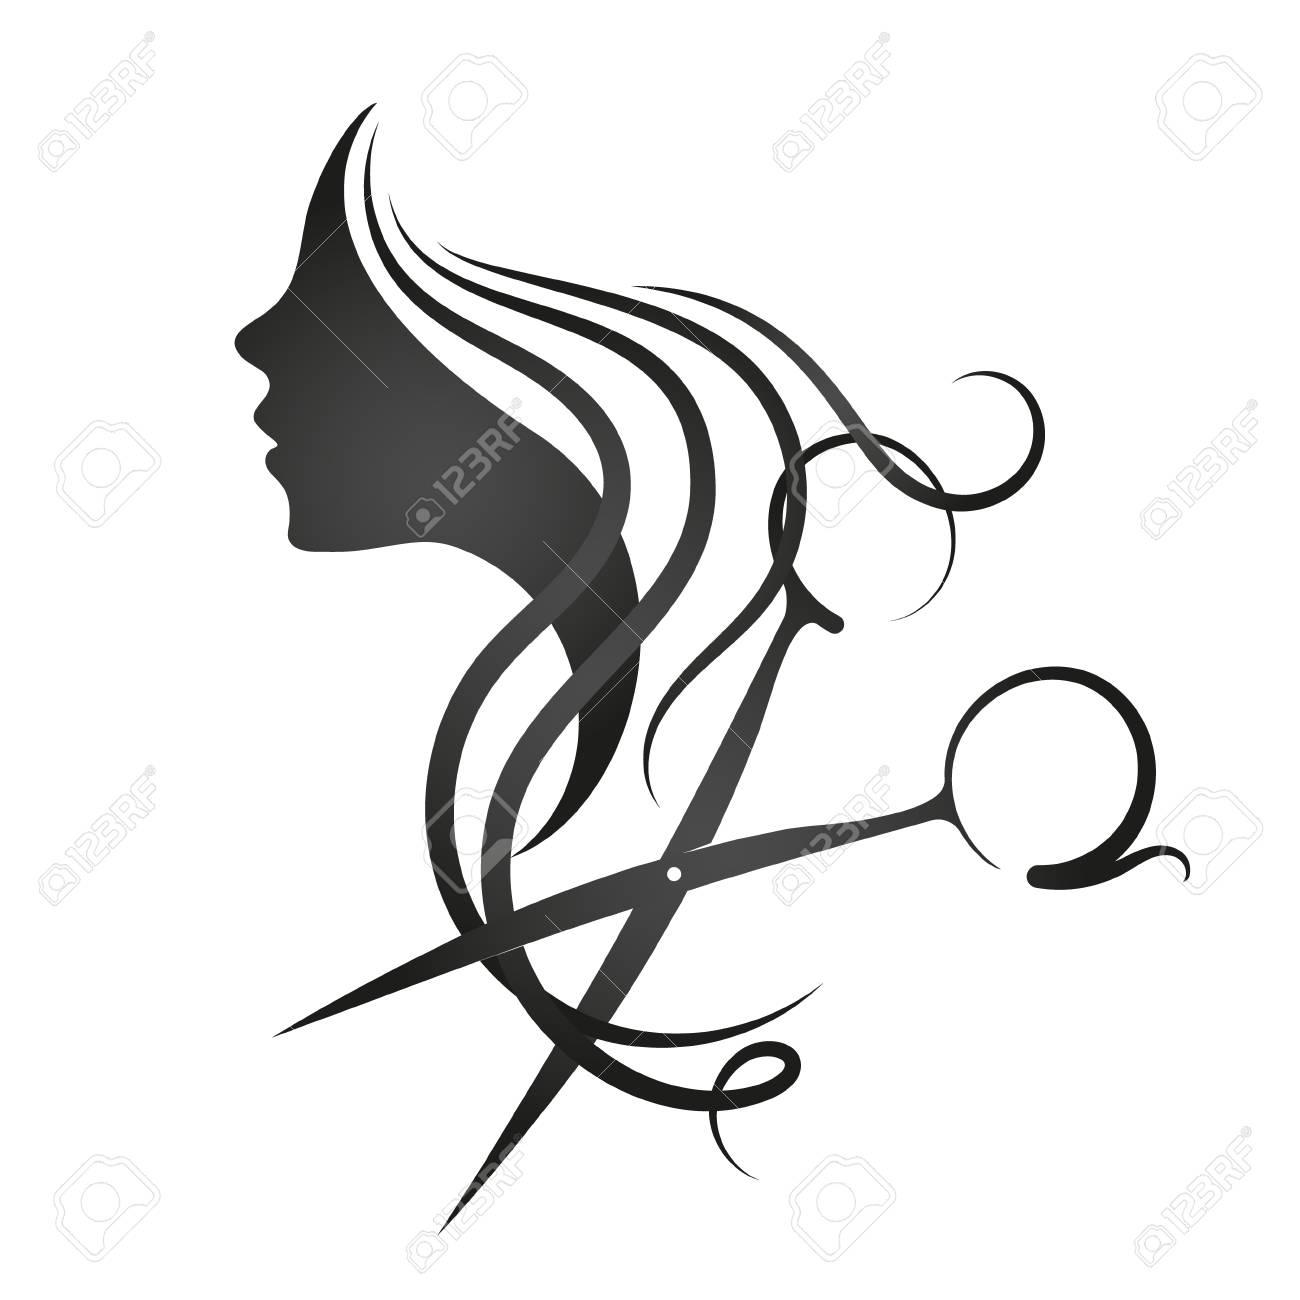 Beauty salon and hairdresser for women symbol - 97450893